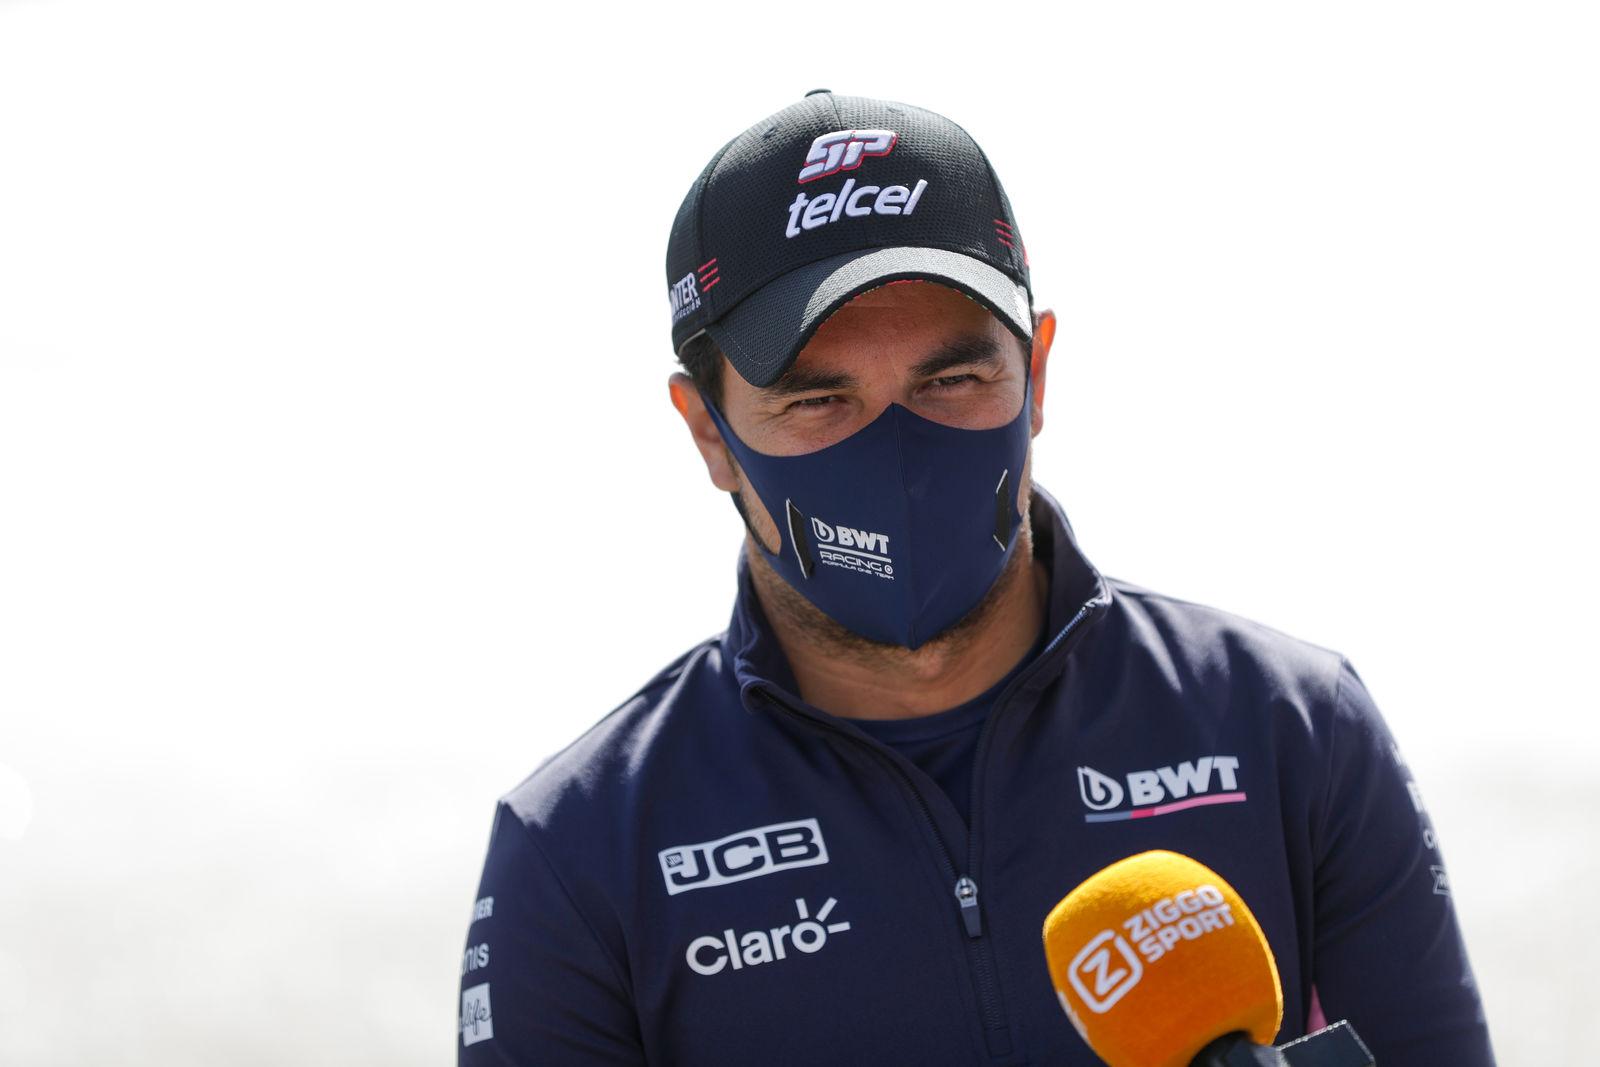 Transferts : Perez chez Red Bull, la rumeur s'intensifie 1